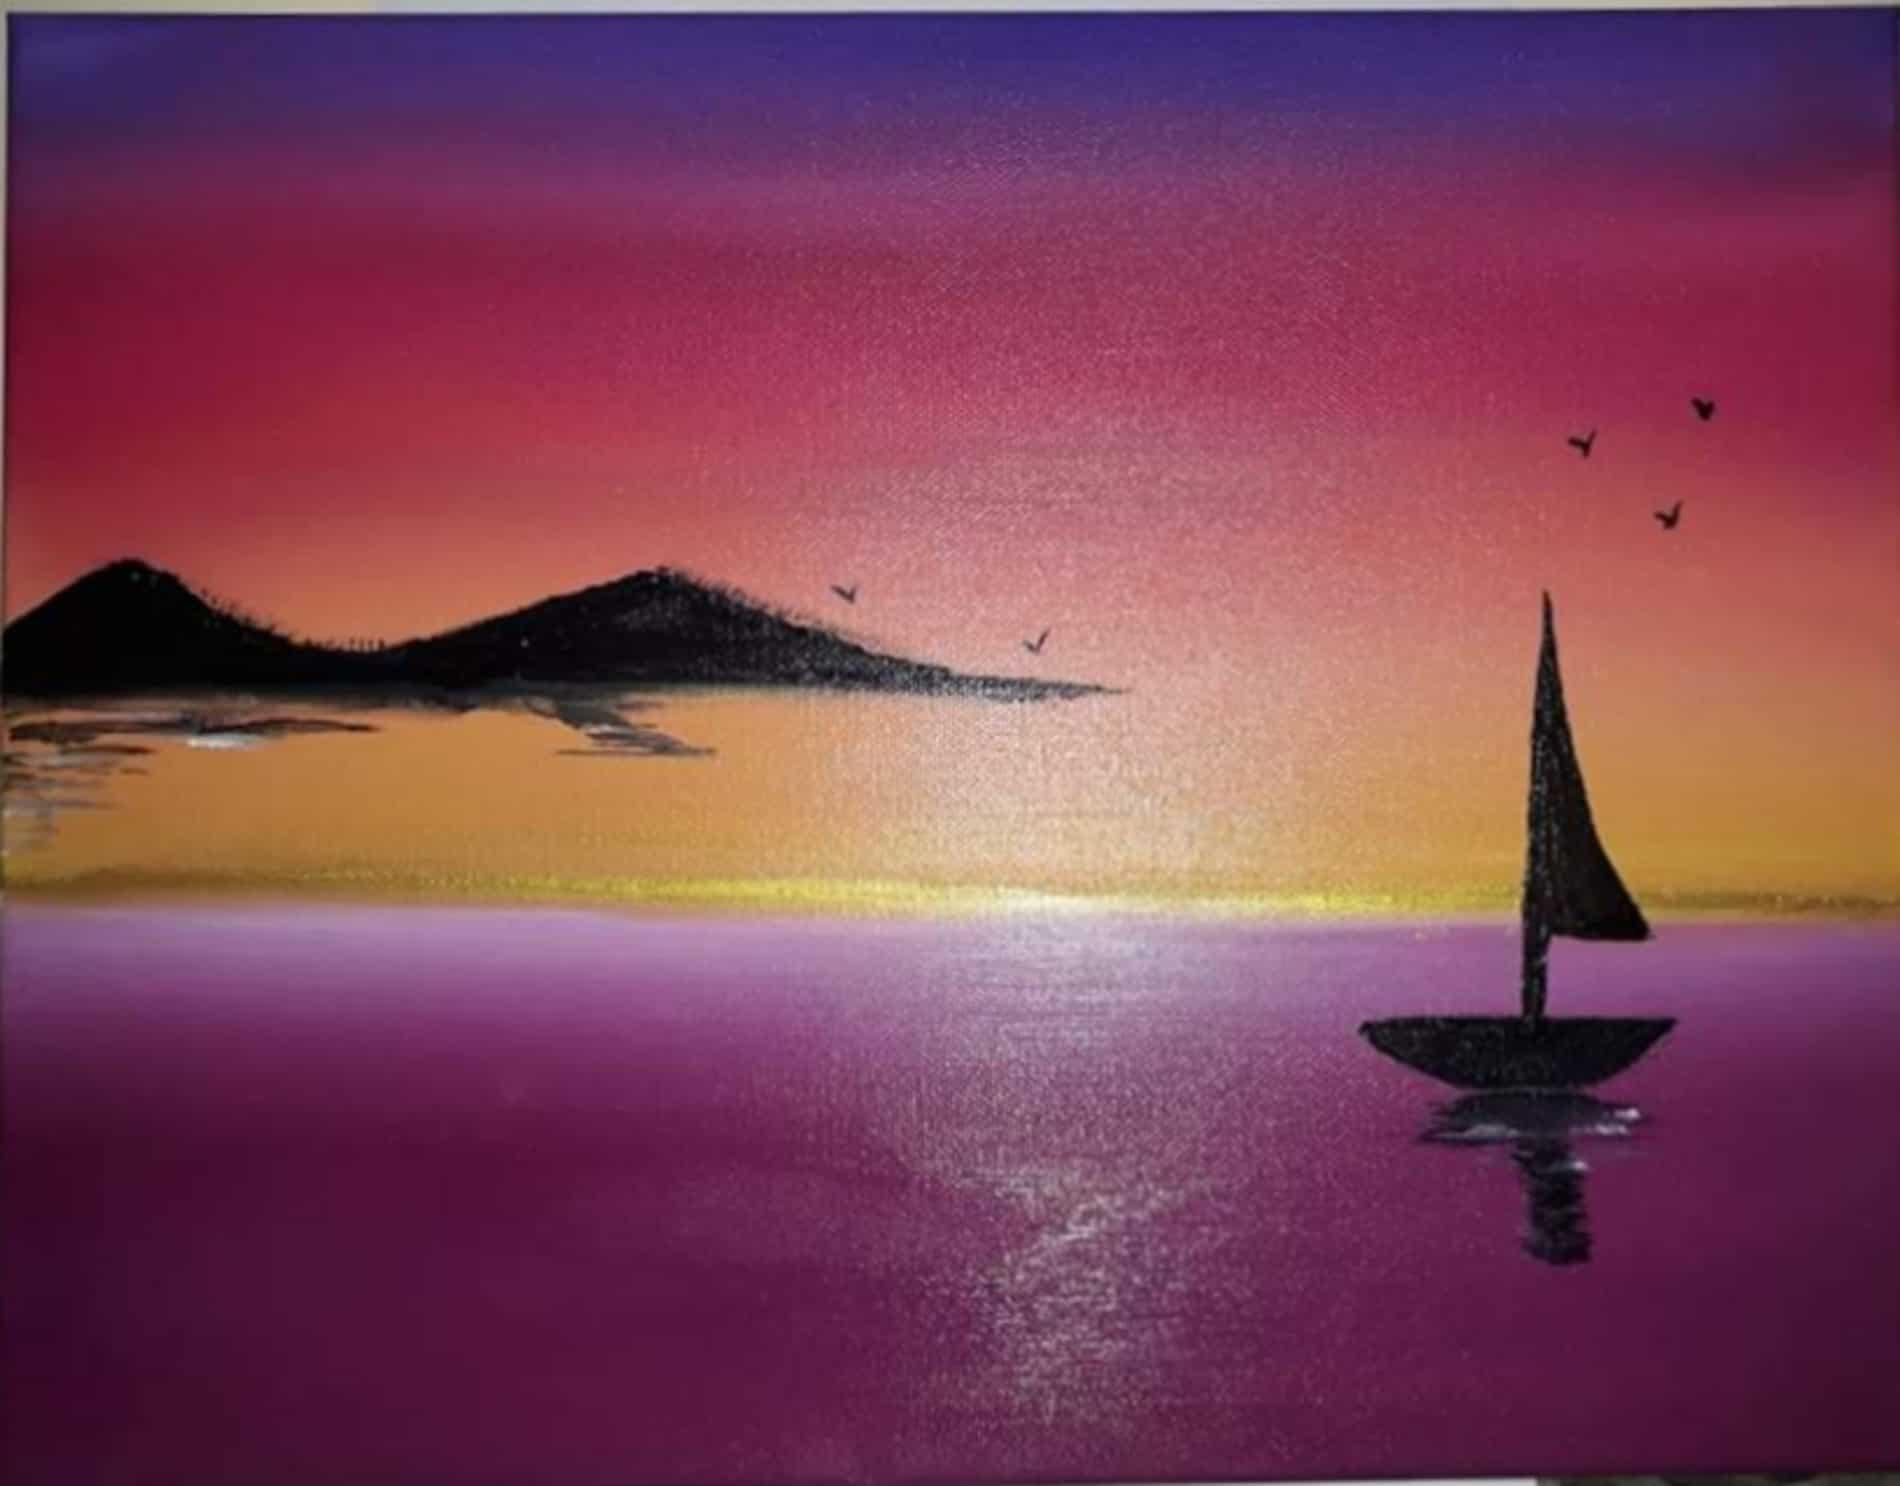 mauritius_arts_juliana_jean_float_or_fly